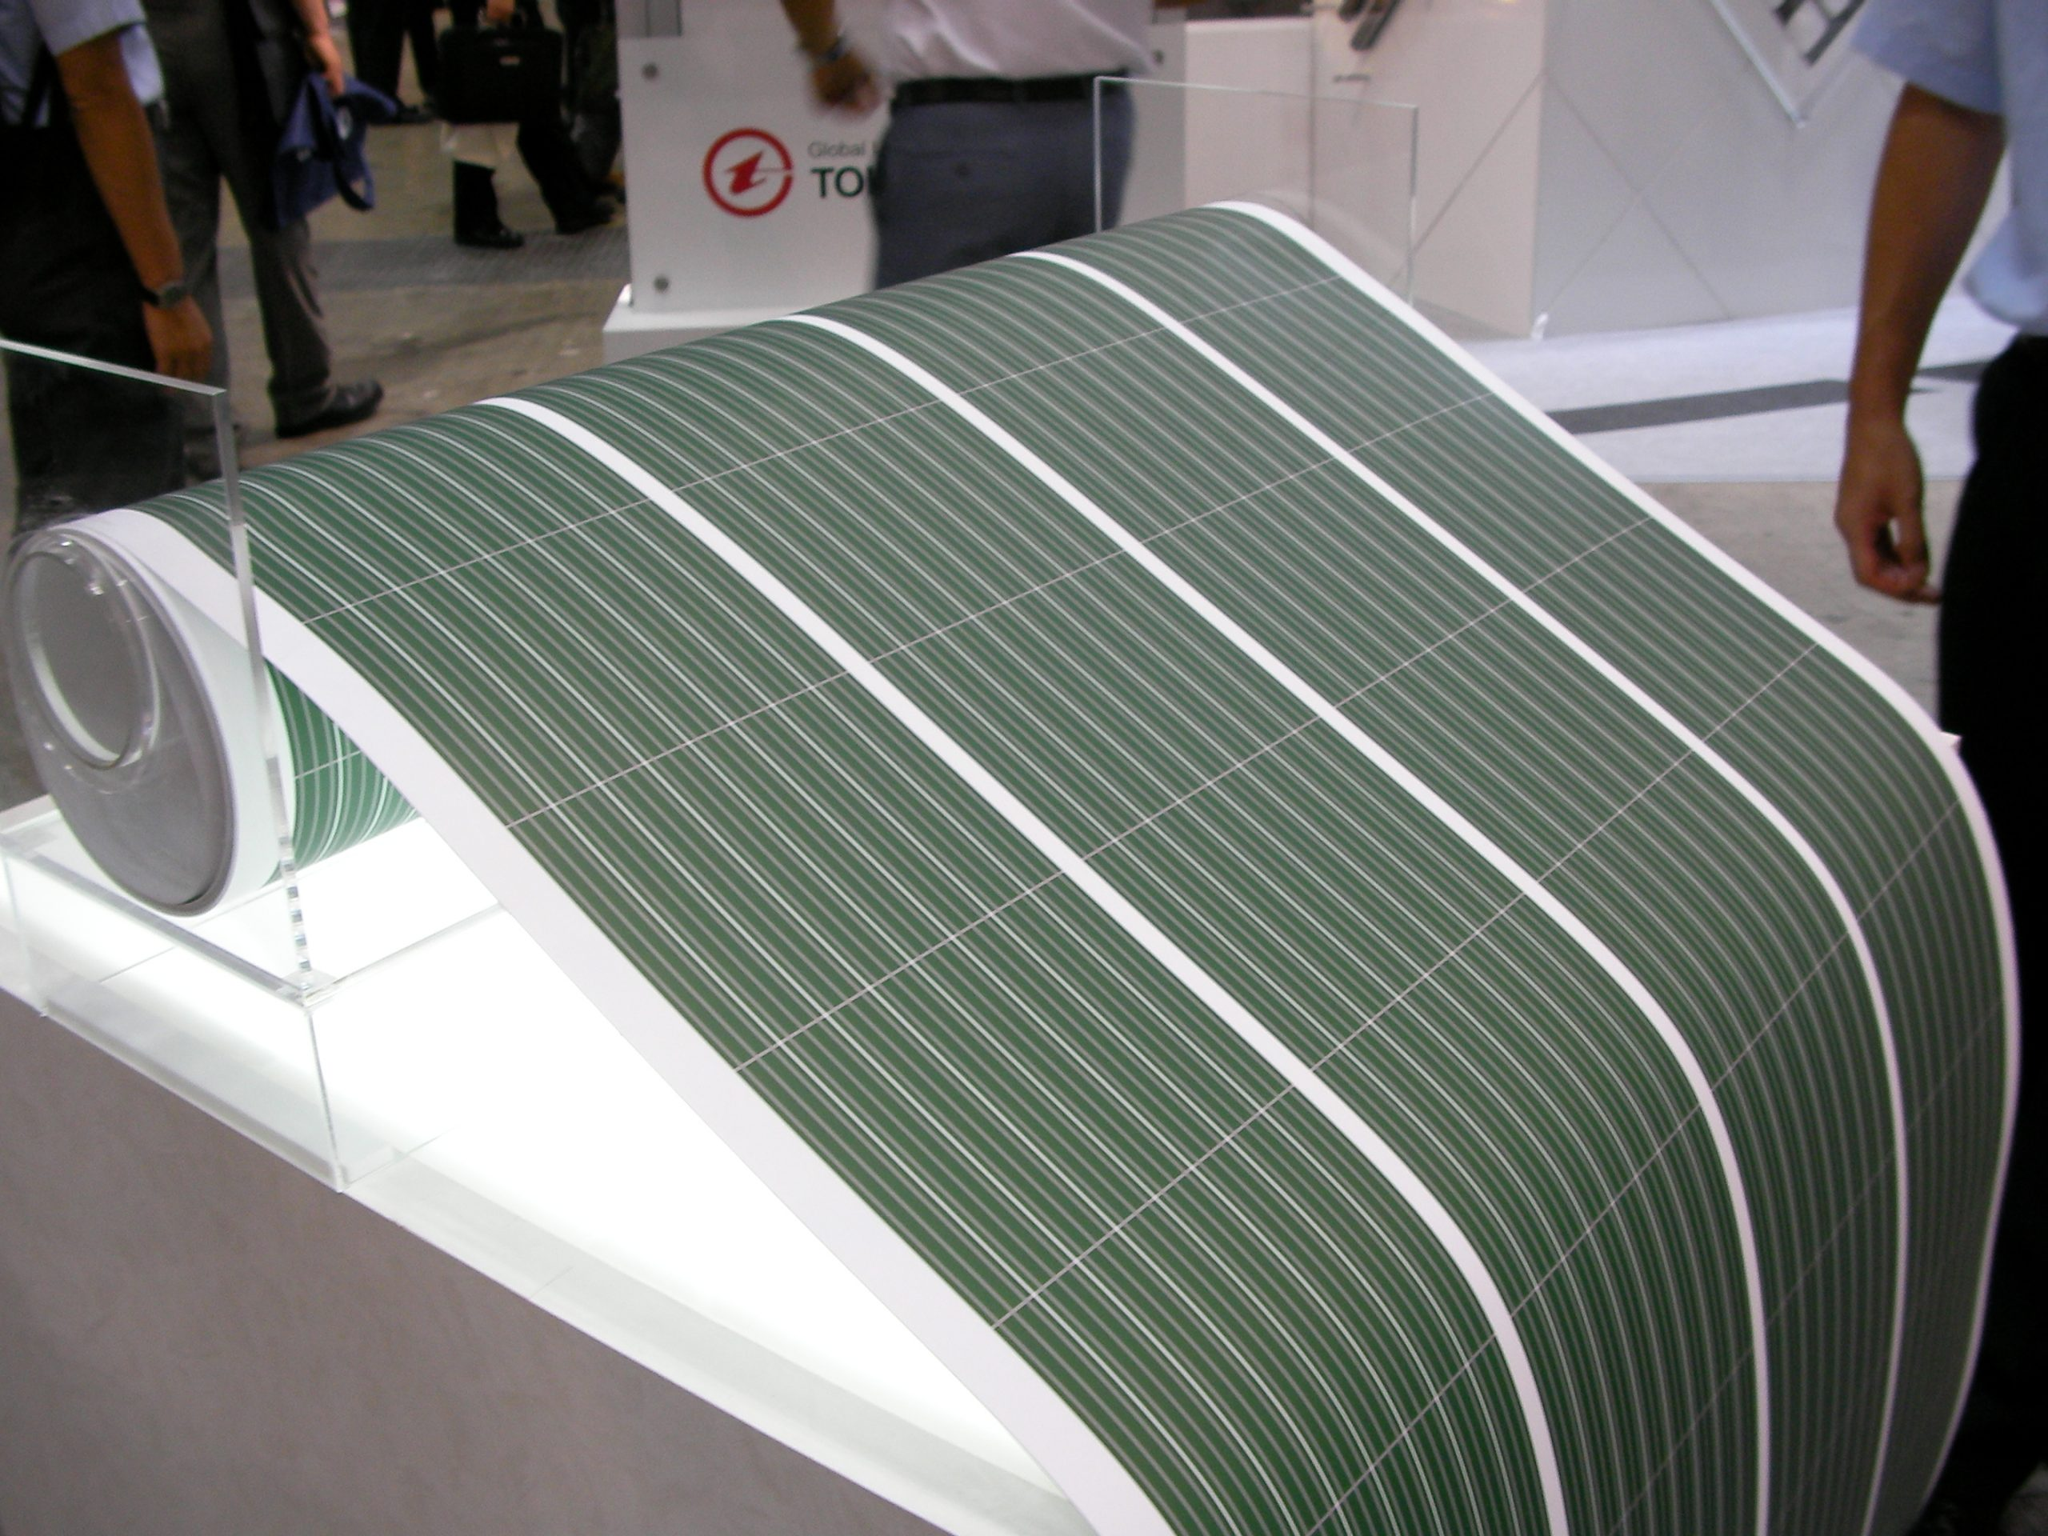 Una impresora capaz de producir placas solares cada dos segundos